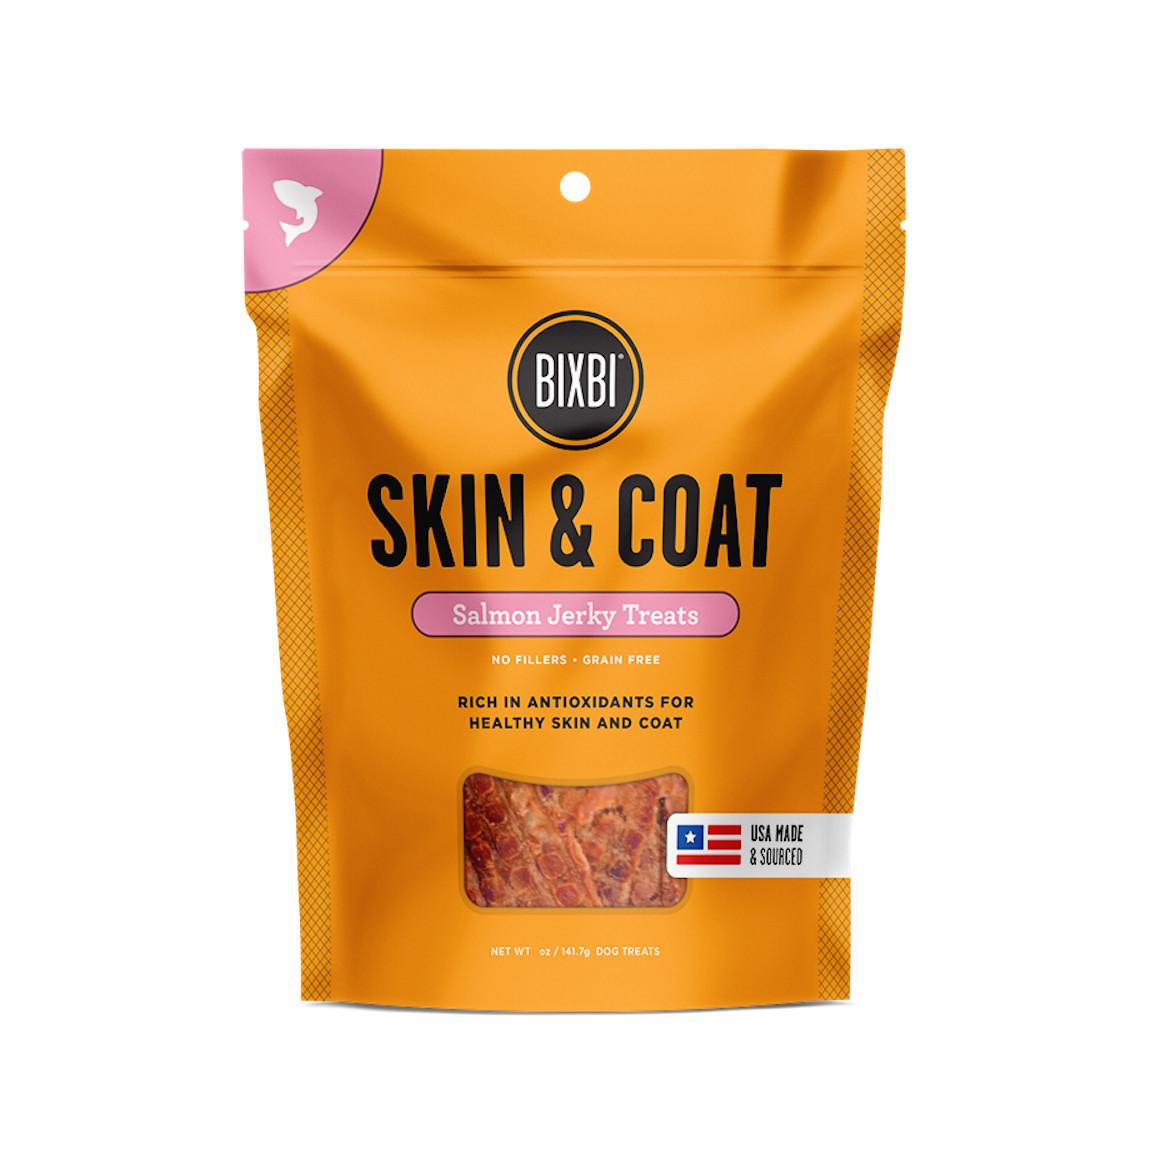 click here to shop Bixbi Skin & Coat Salmon Jerky Dog Treats